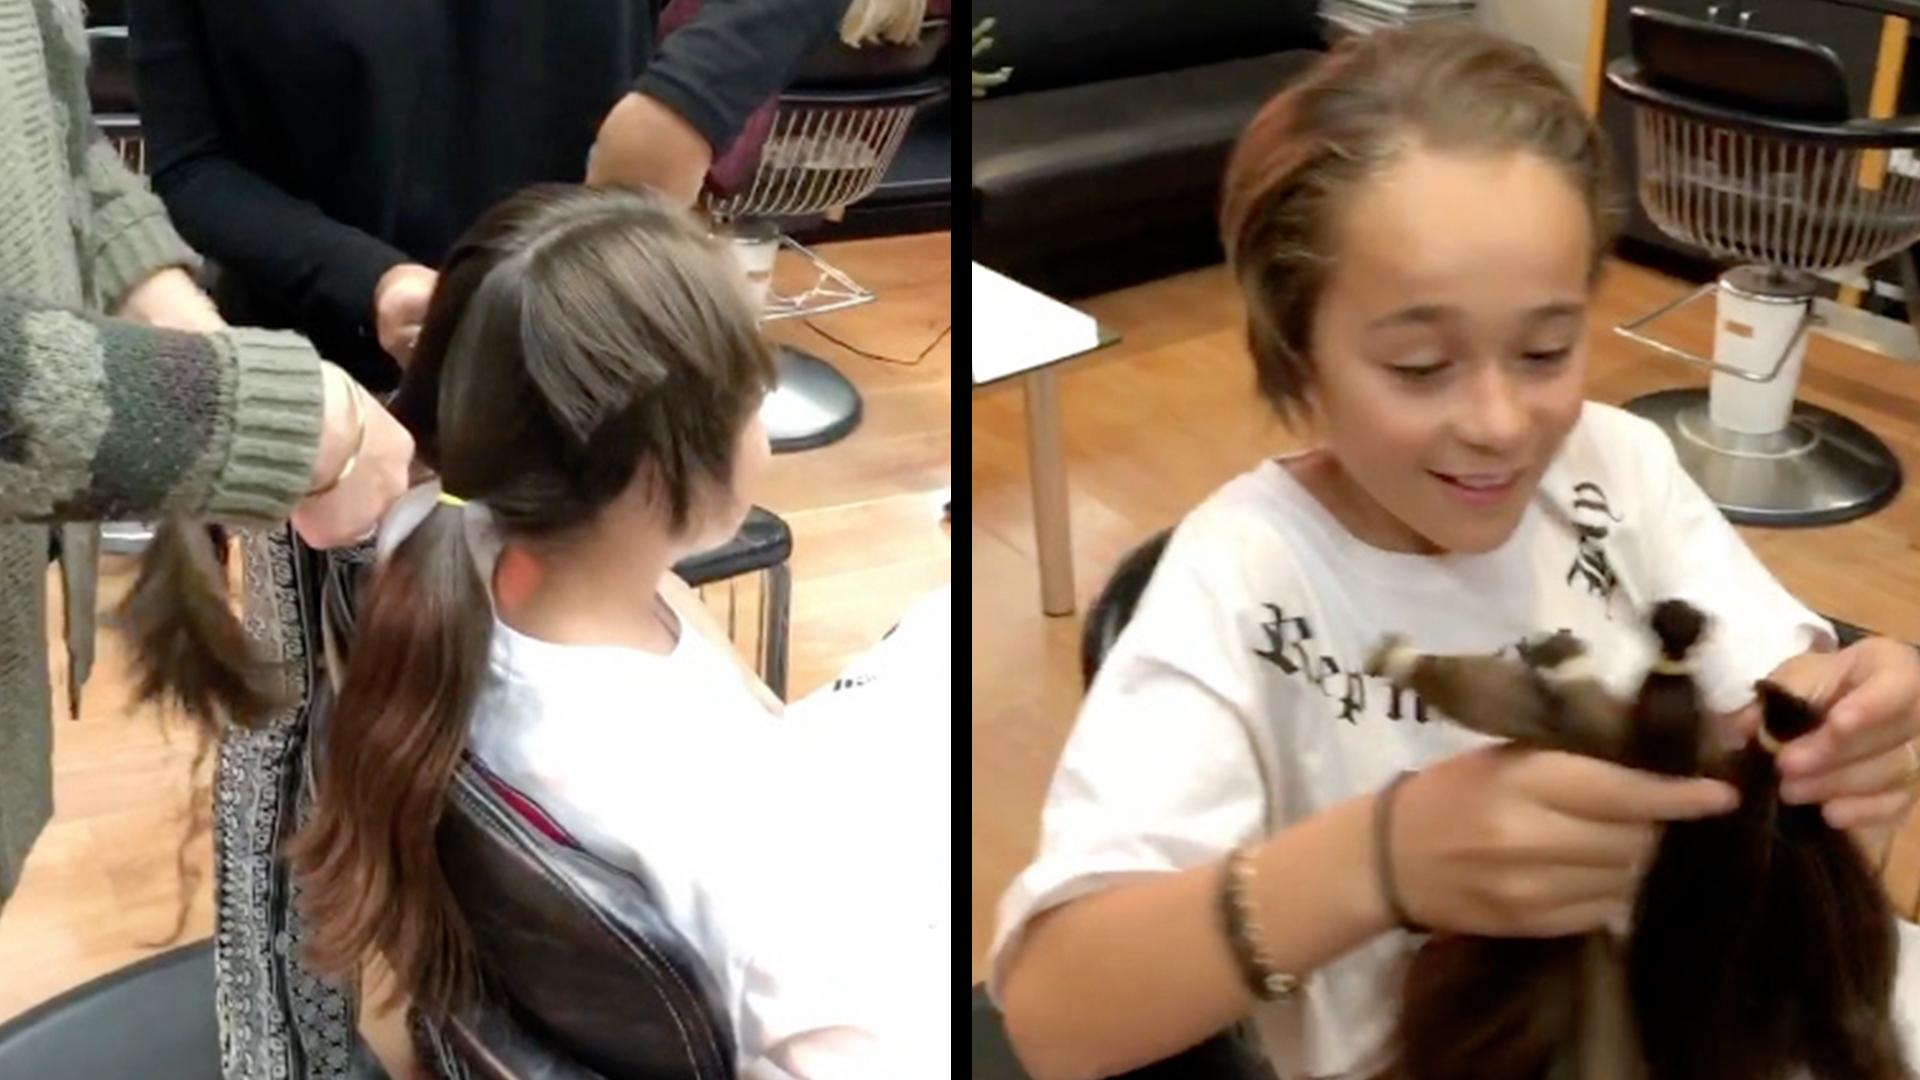 AJ Stuntz Cuts His Long Hair For 'Locks Of Love'